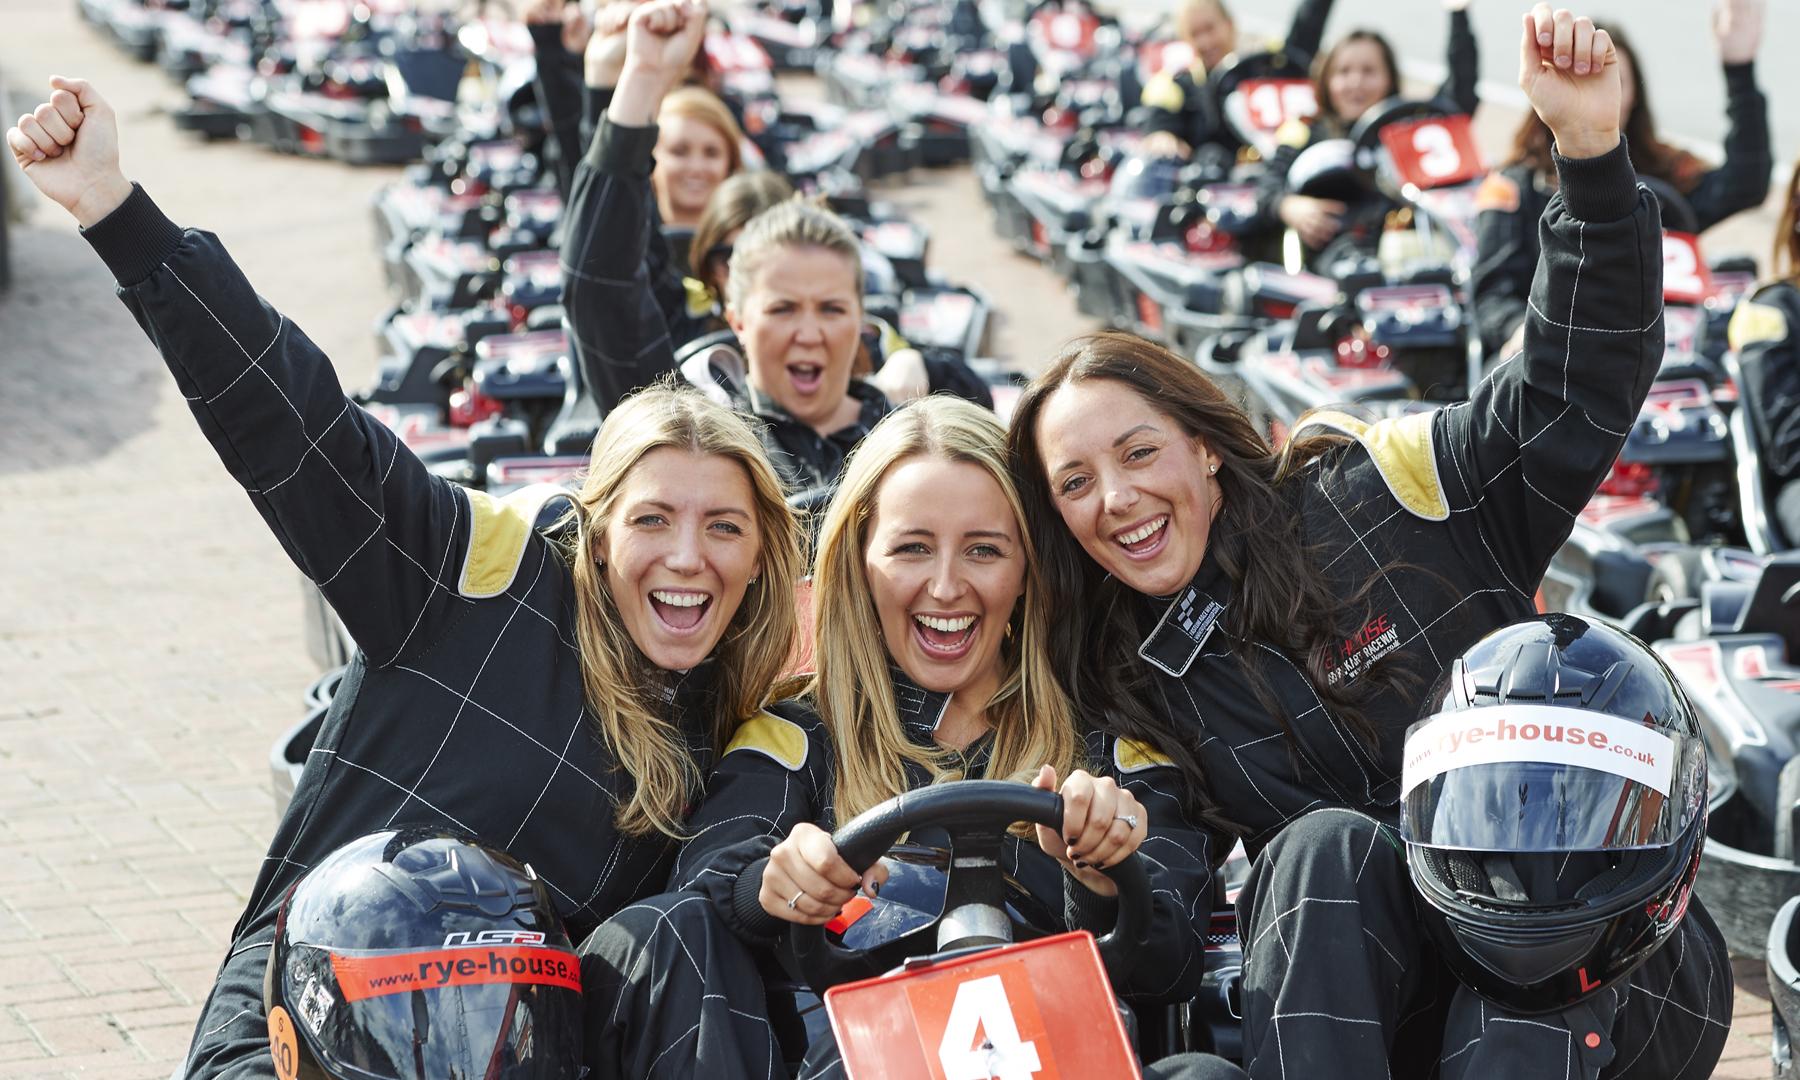 females go kart racing